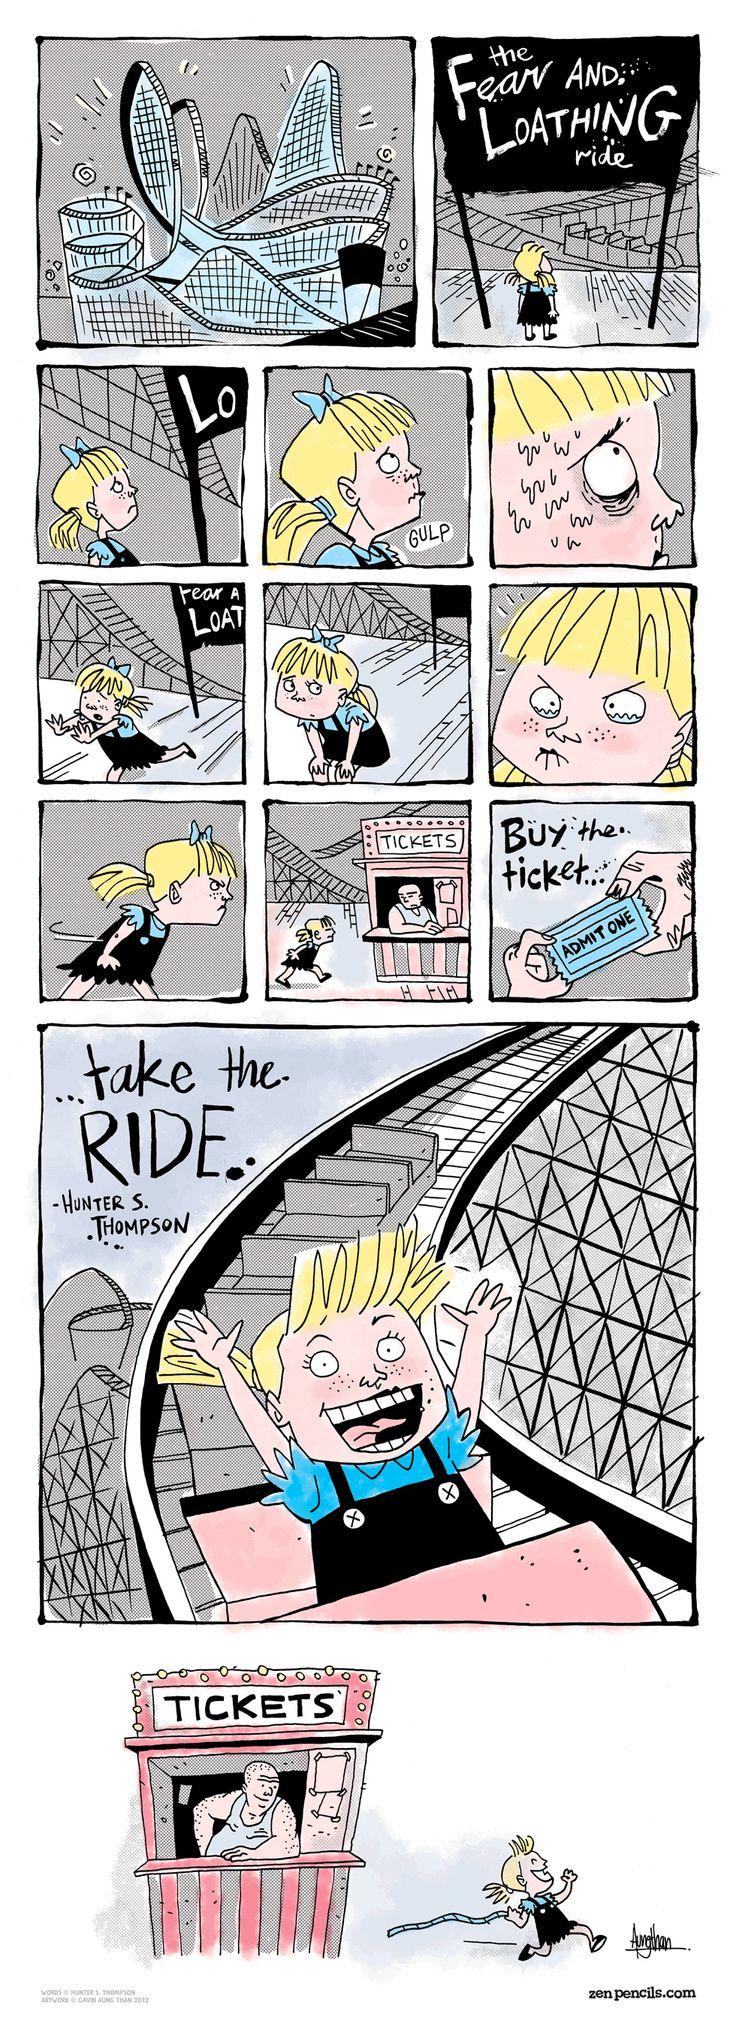 awesome: Pencil Comic, Hunters S Thompson, Interesting Artworks, Hunters Thompson, Comic Books, Inspiration Comic, Cheap Nike, Loath Riding, Riding Everybodi Has A Brain